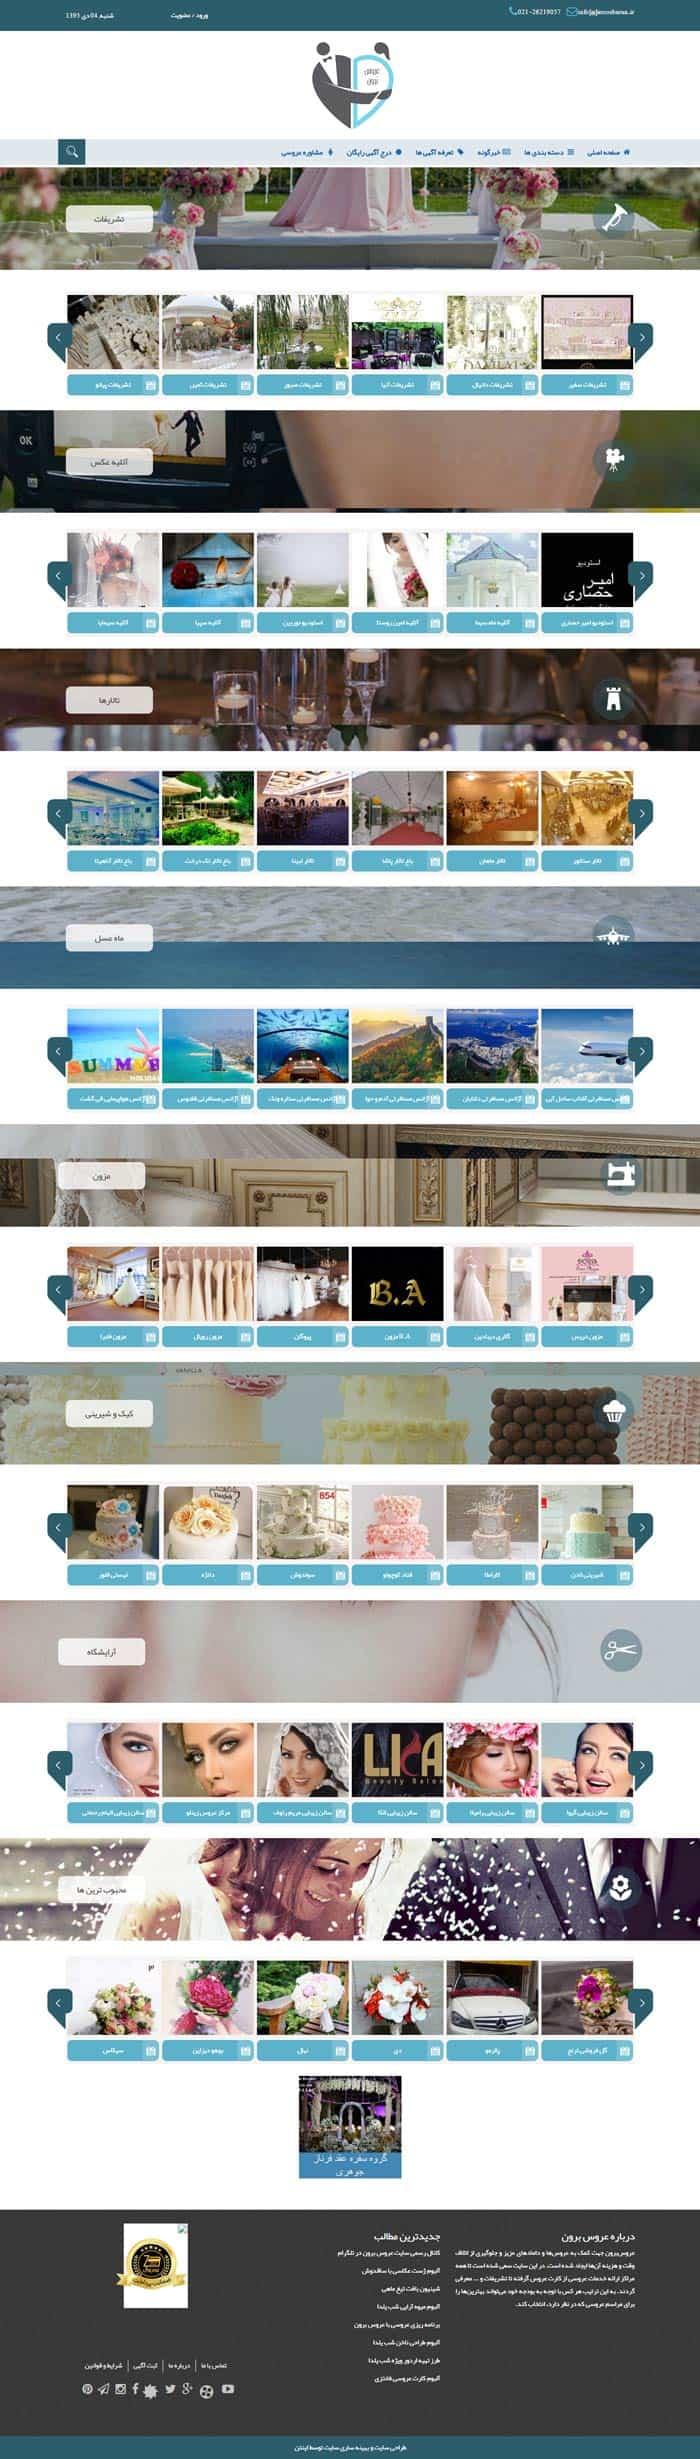 نمونه کار طراحی سایت عروس برون